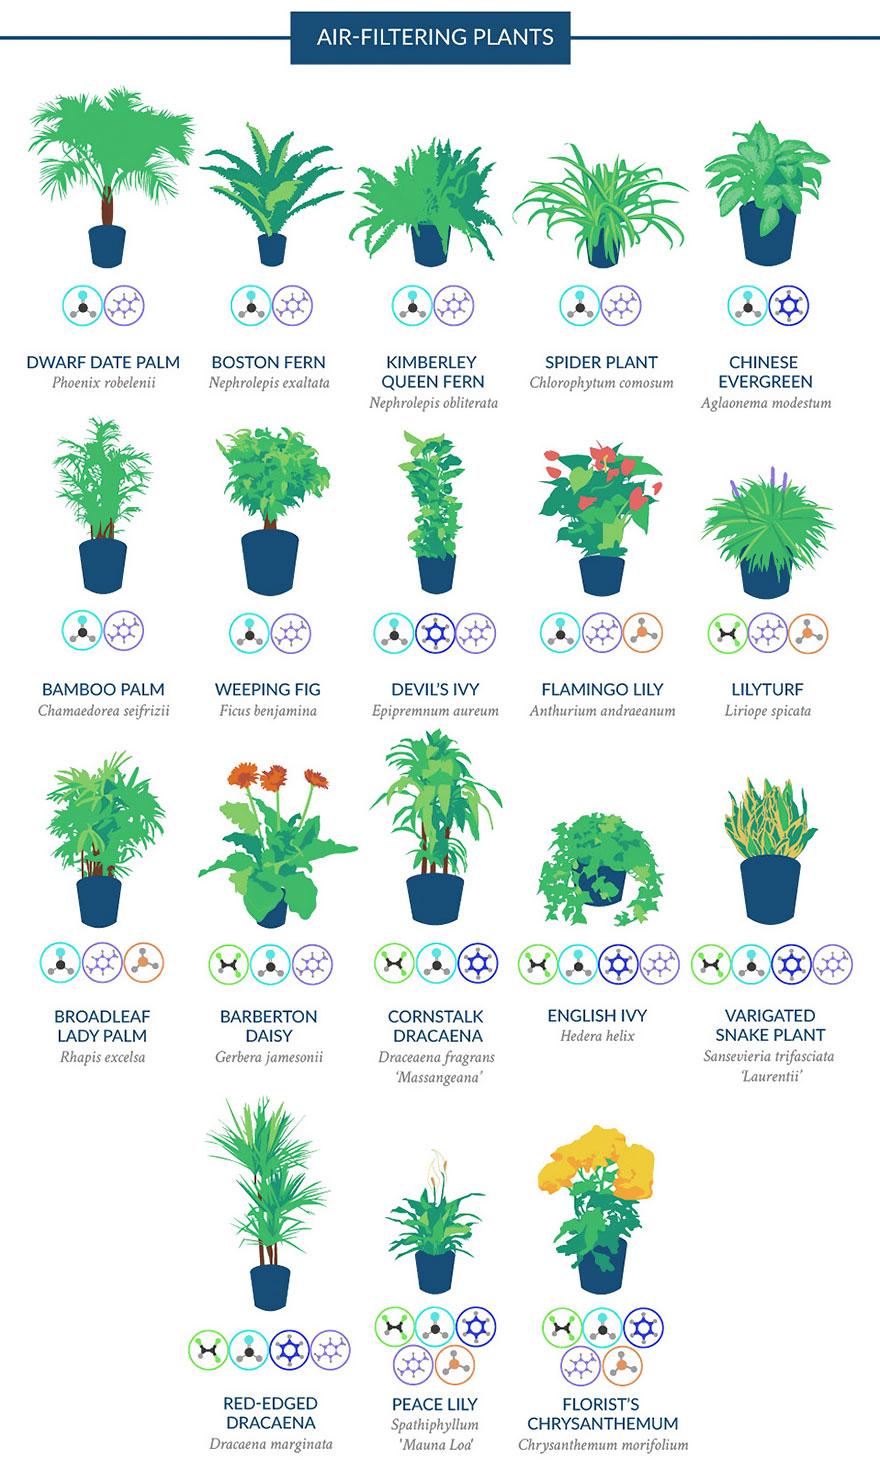 Air filtering plants.jpg